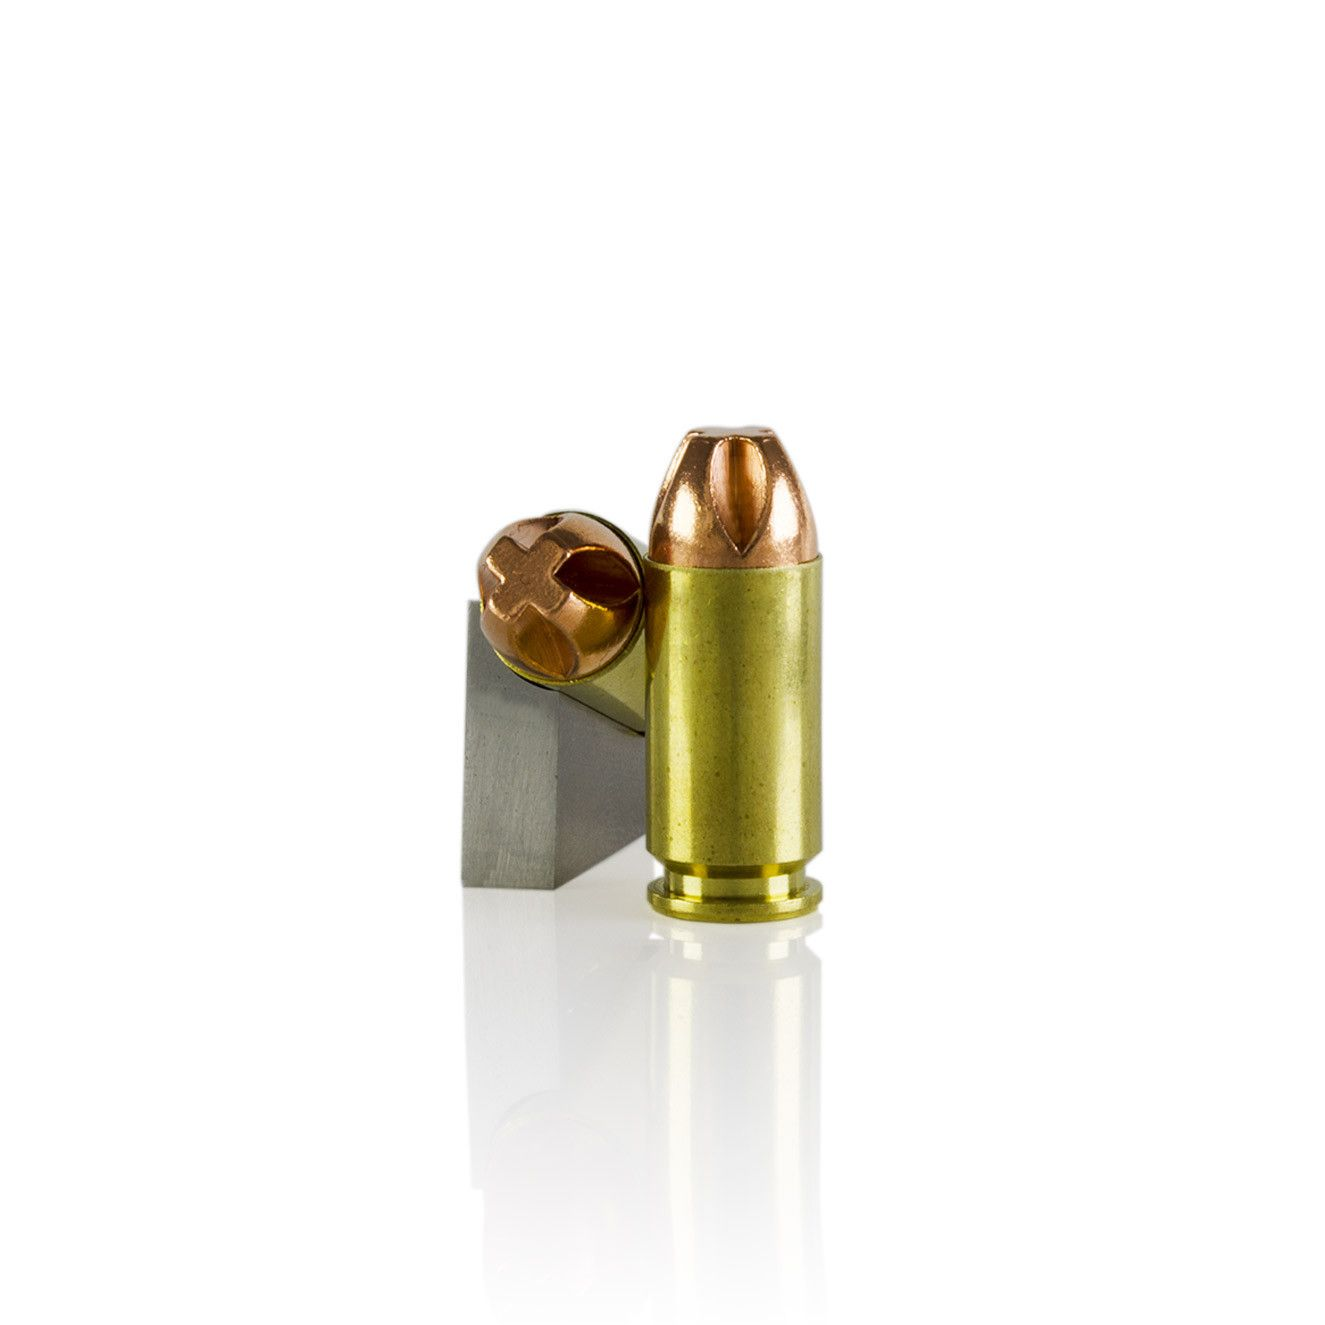 40 S&W 140gr Xtreme Penetrator Ammunition: The bullet is